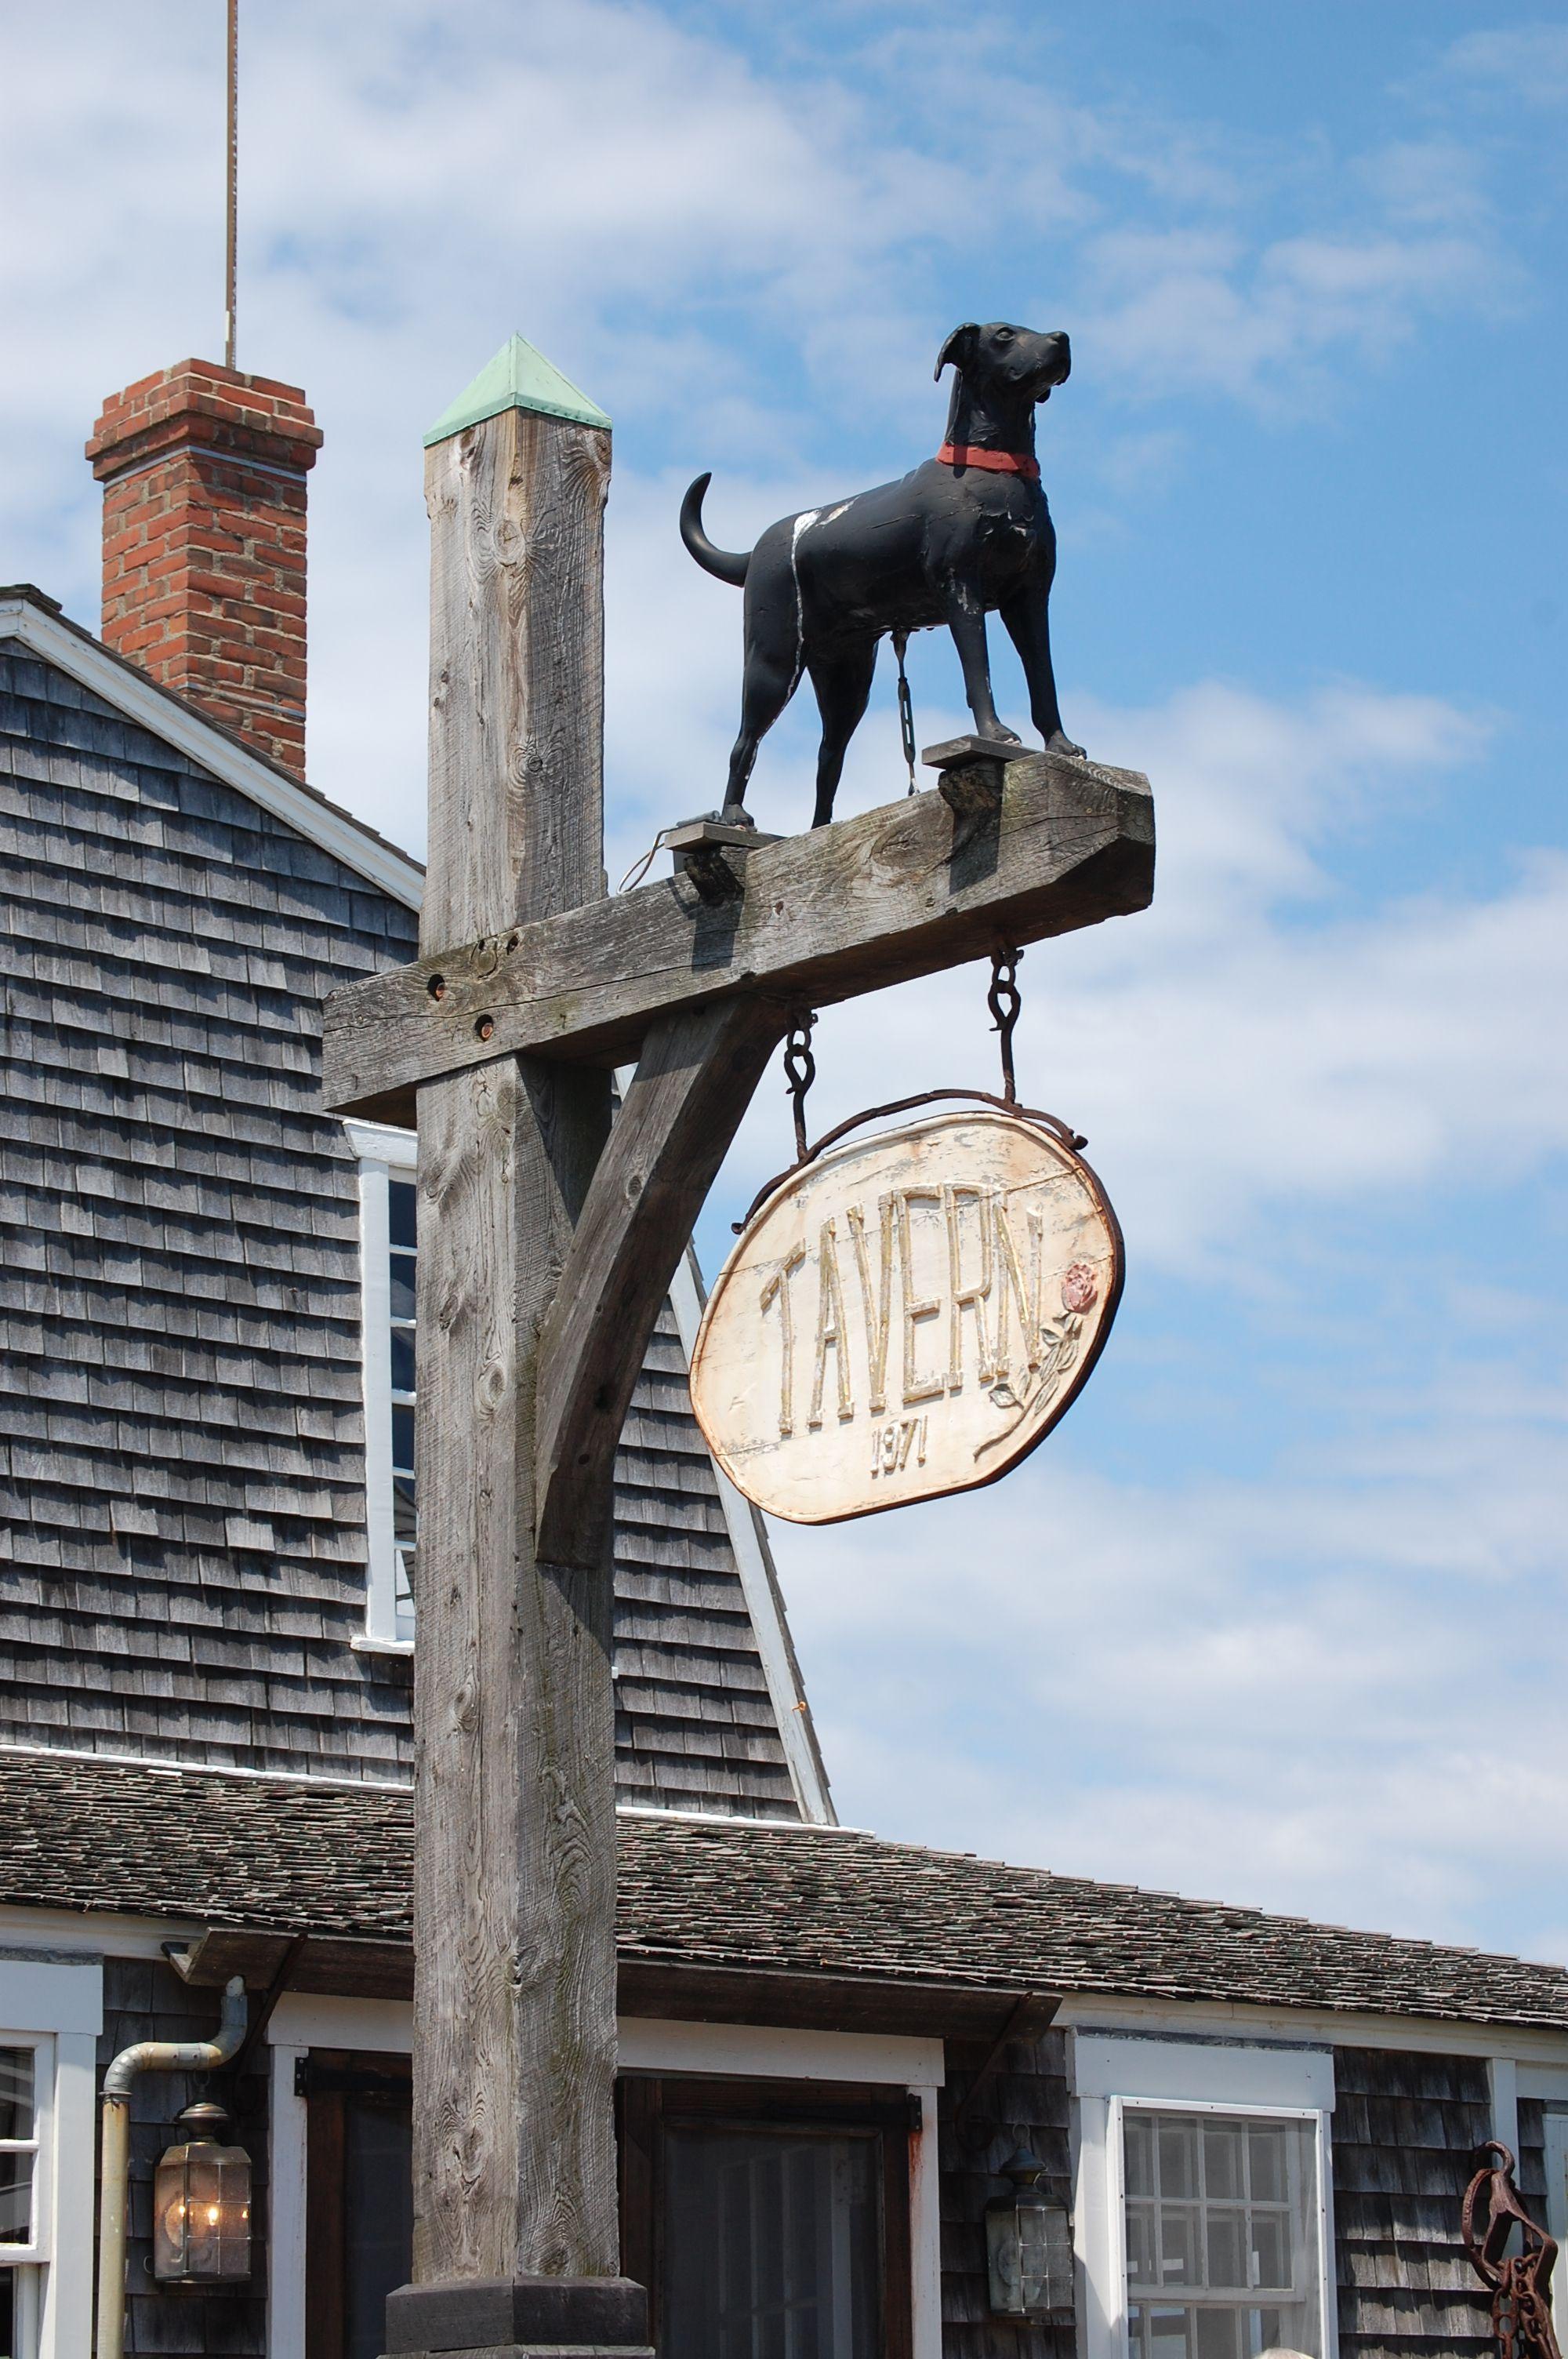 Black dog mv black dog new england favorite places